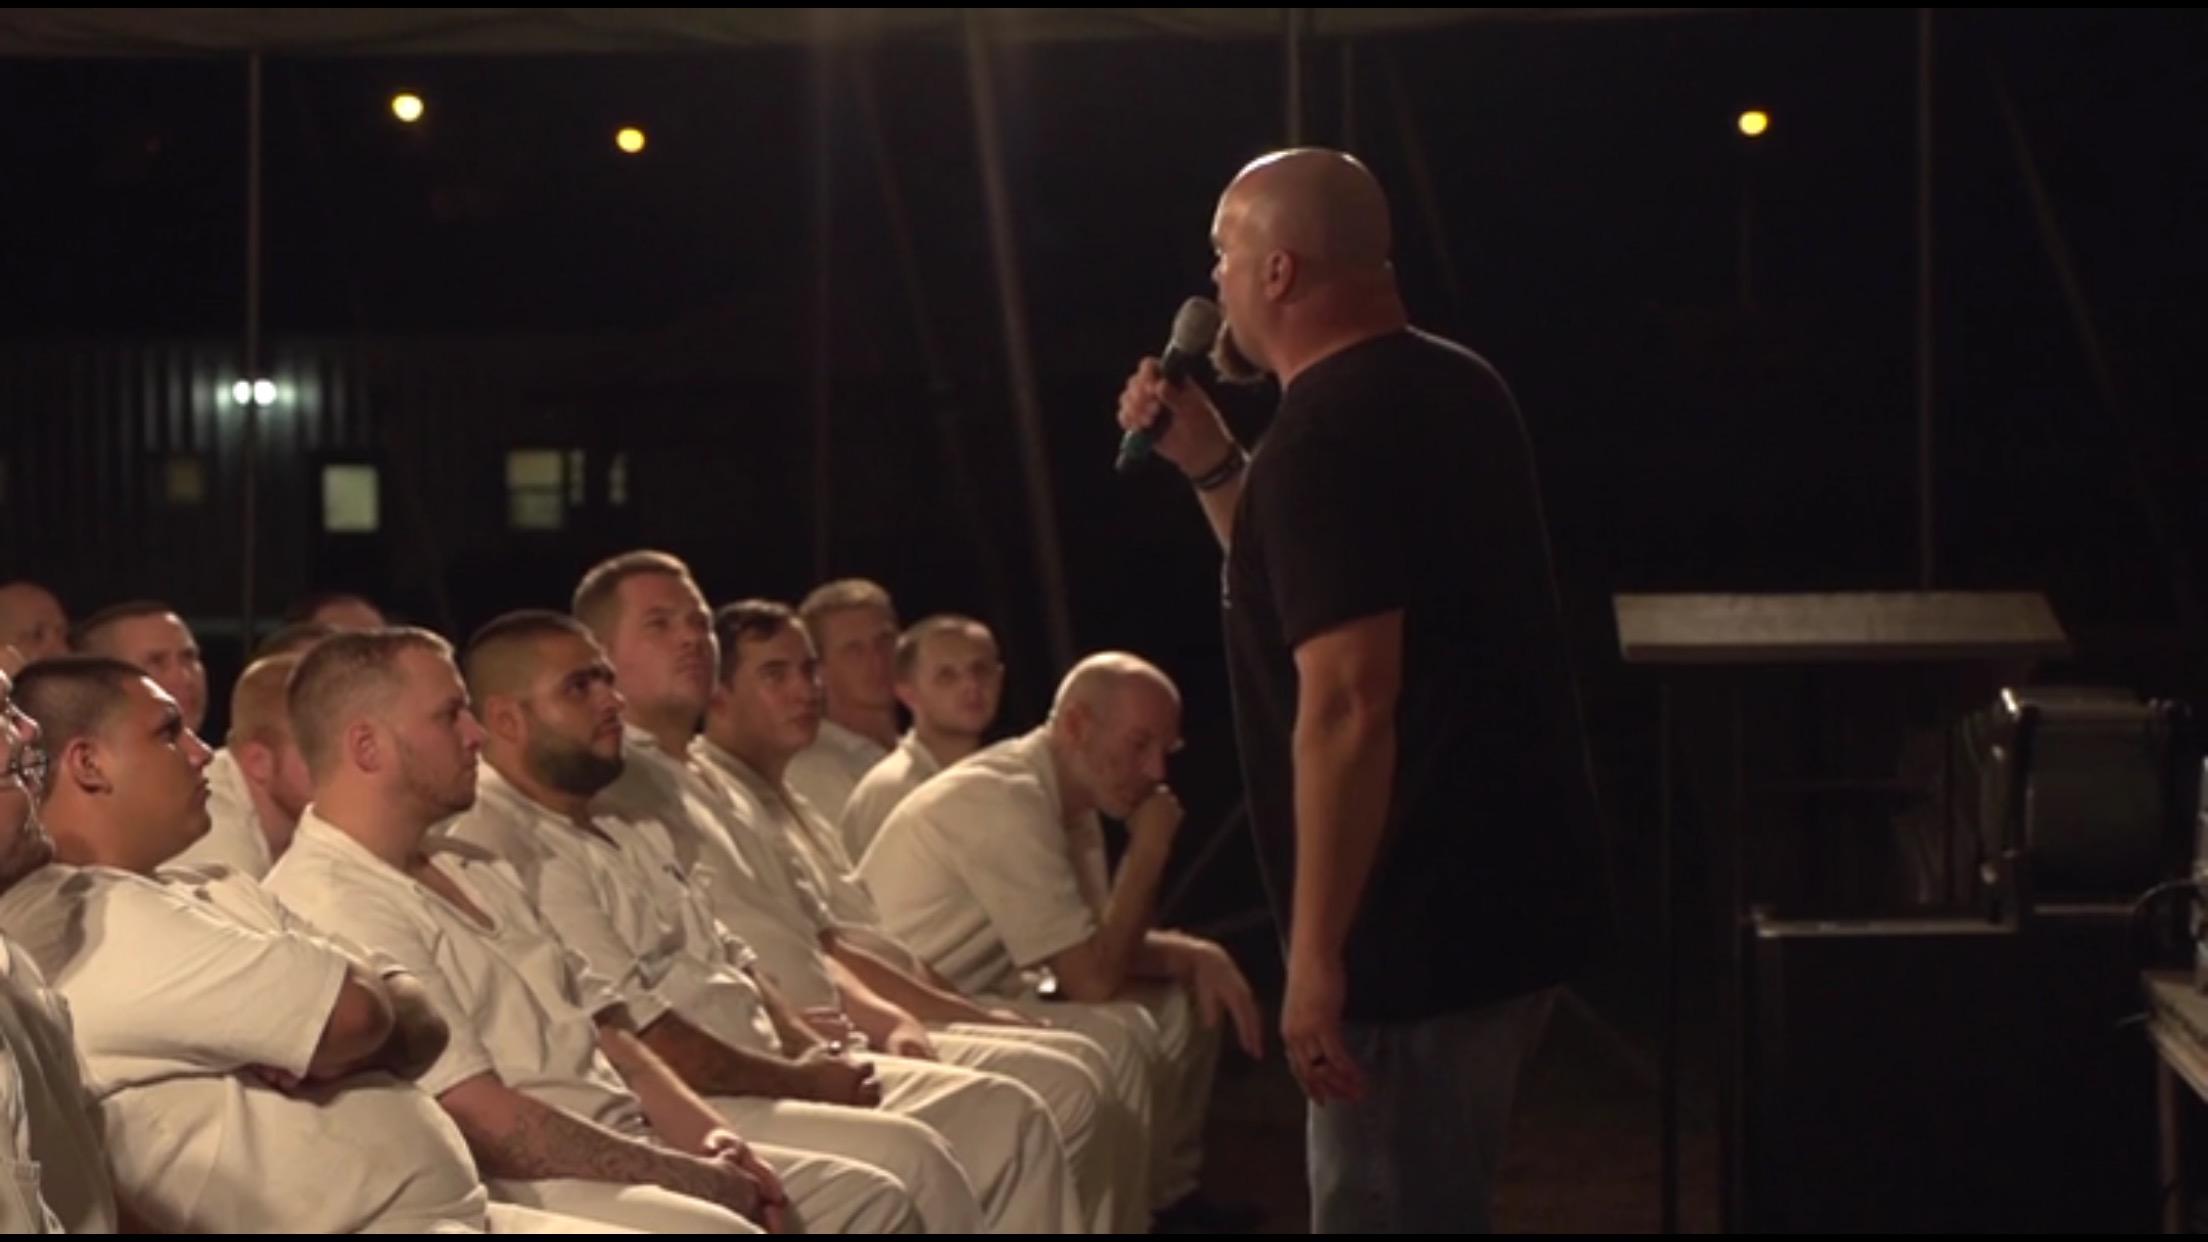 Jay Dan speaking to the men at the Walker Sayle Unit in Breckenridge, TX